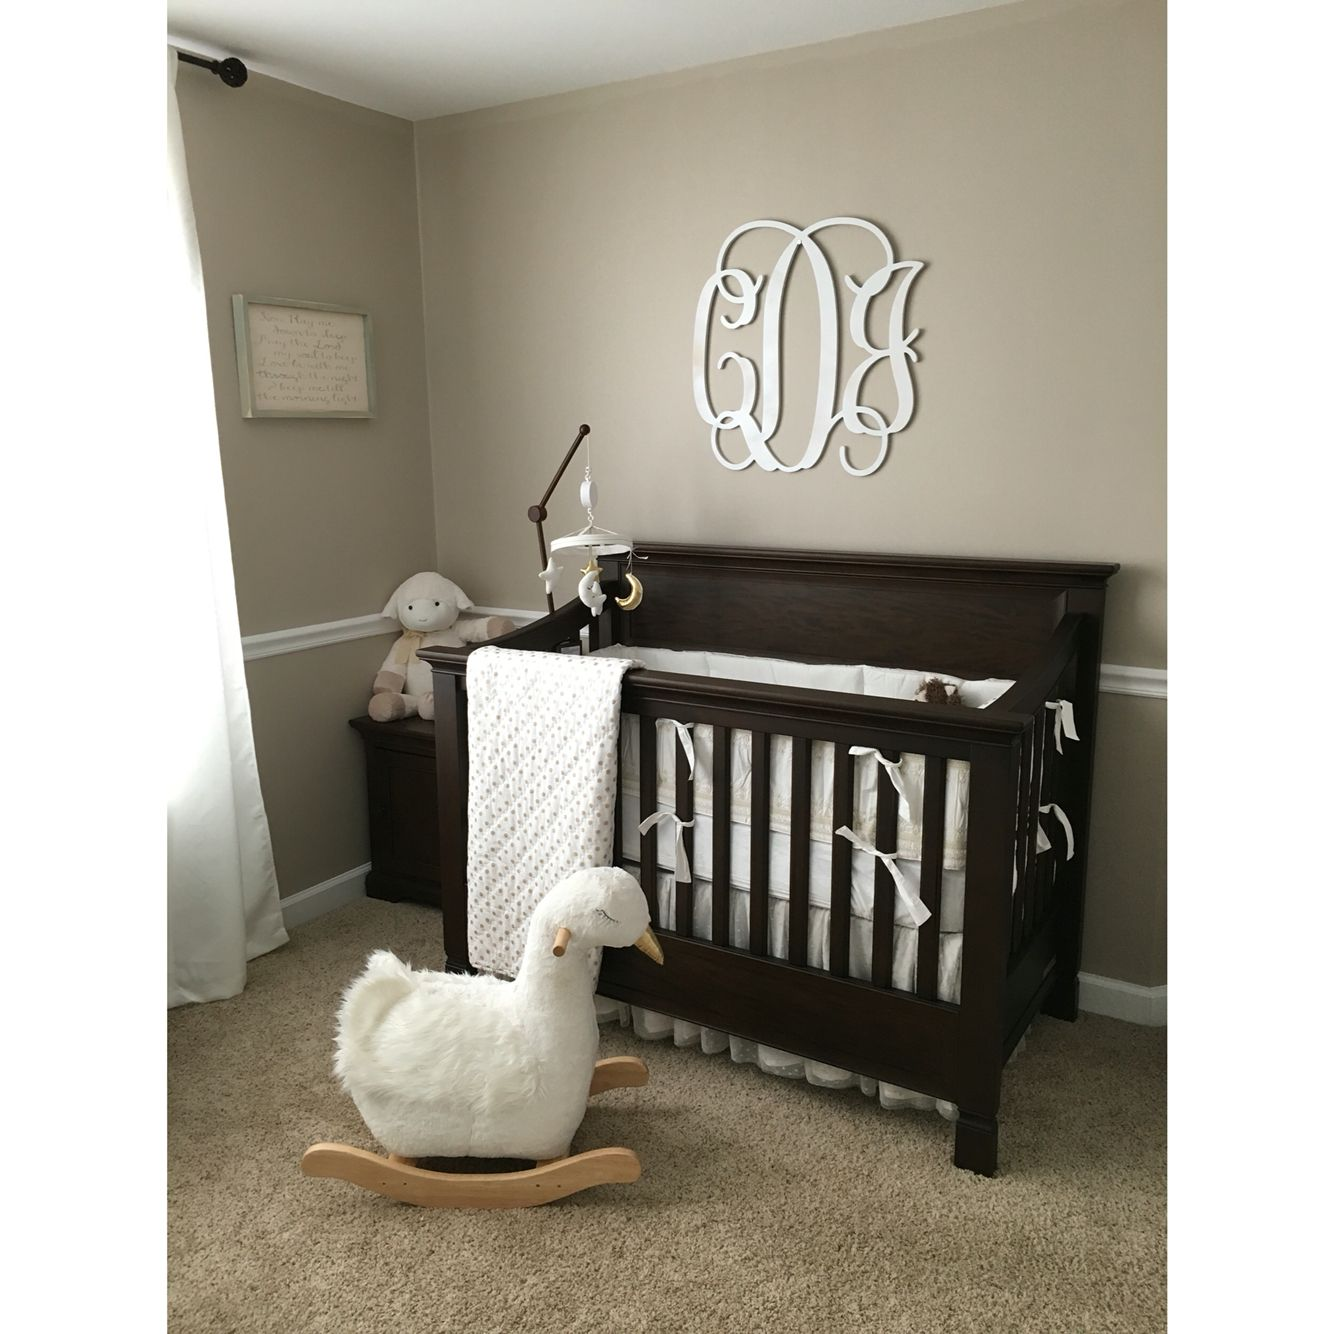 pottery barn baby rocking chair mahogany dining room table and 8 chairs kids larkin crib swan rocker tan